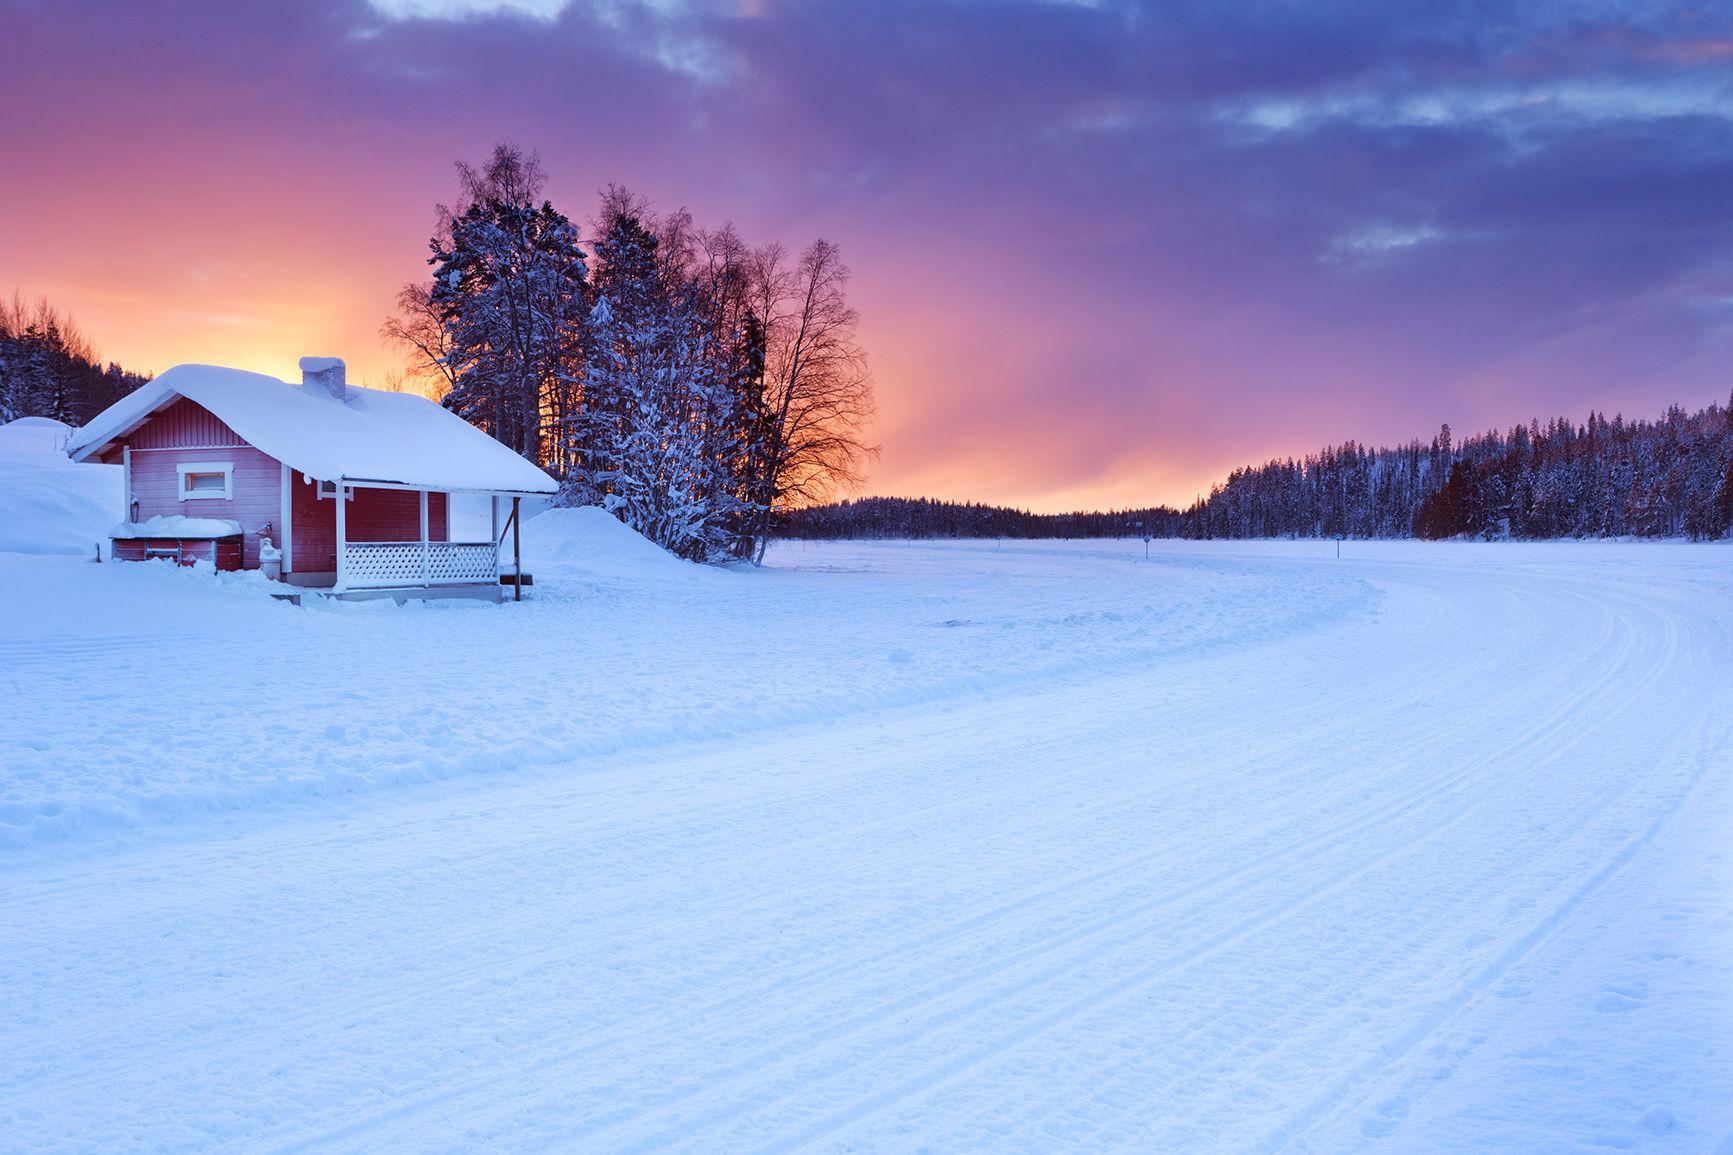 sara_winter | istockphoto.com